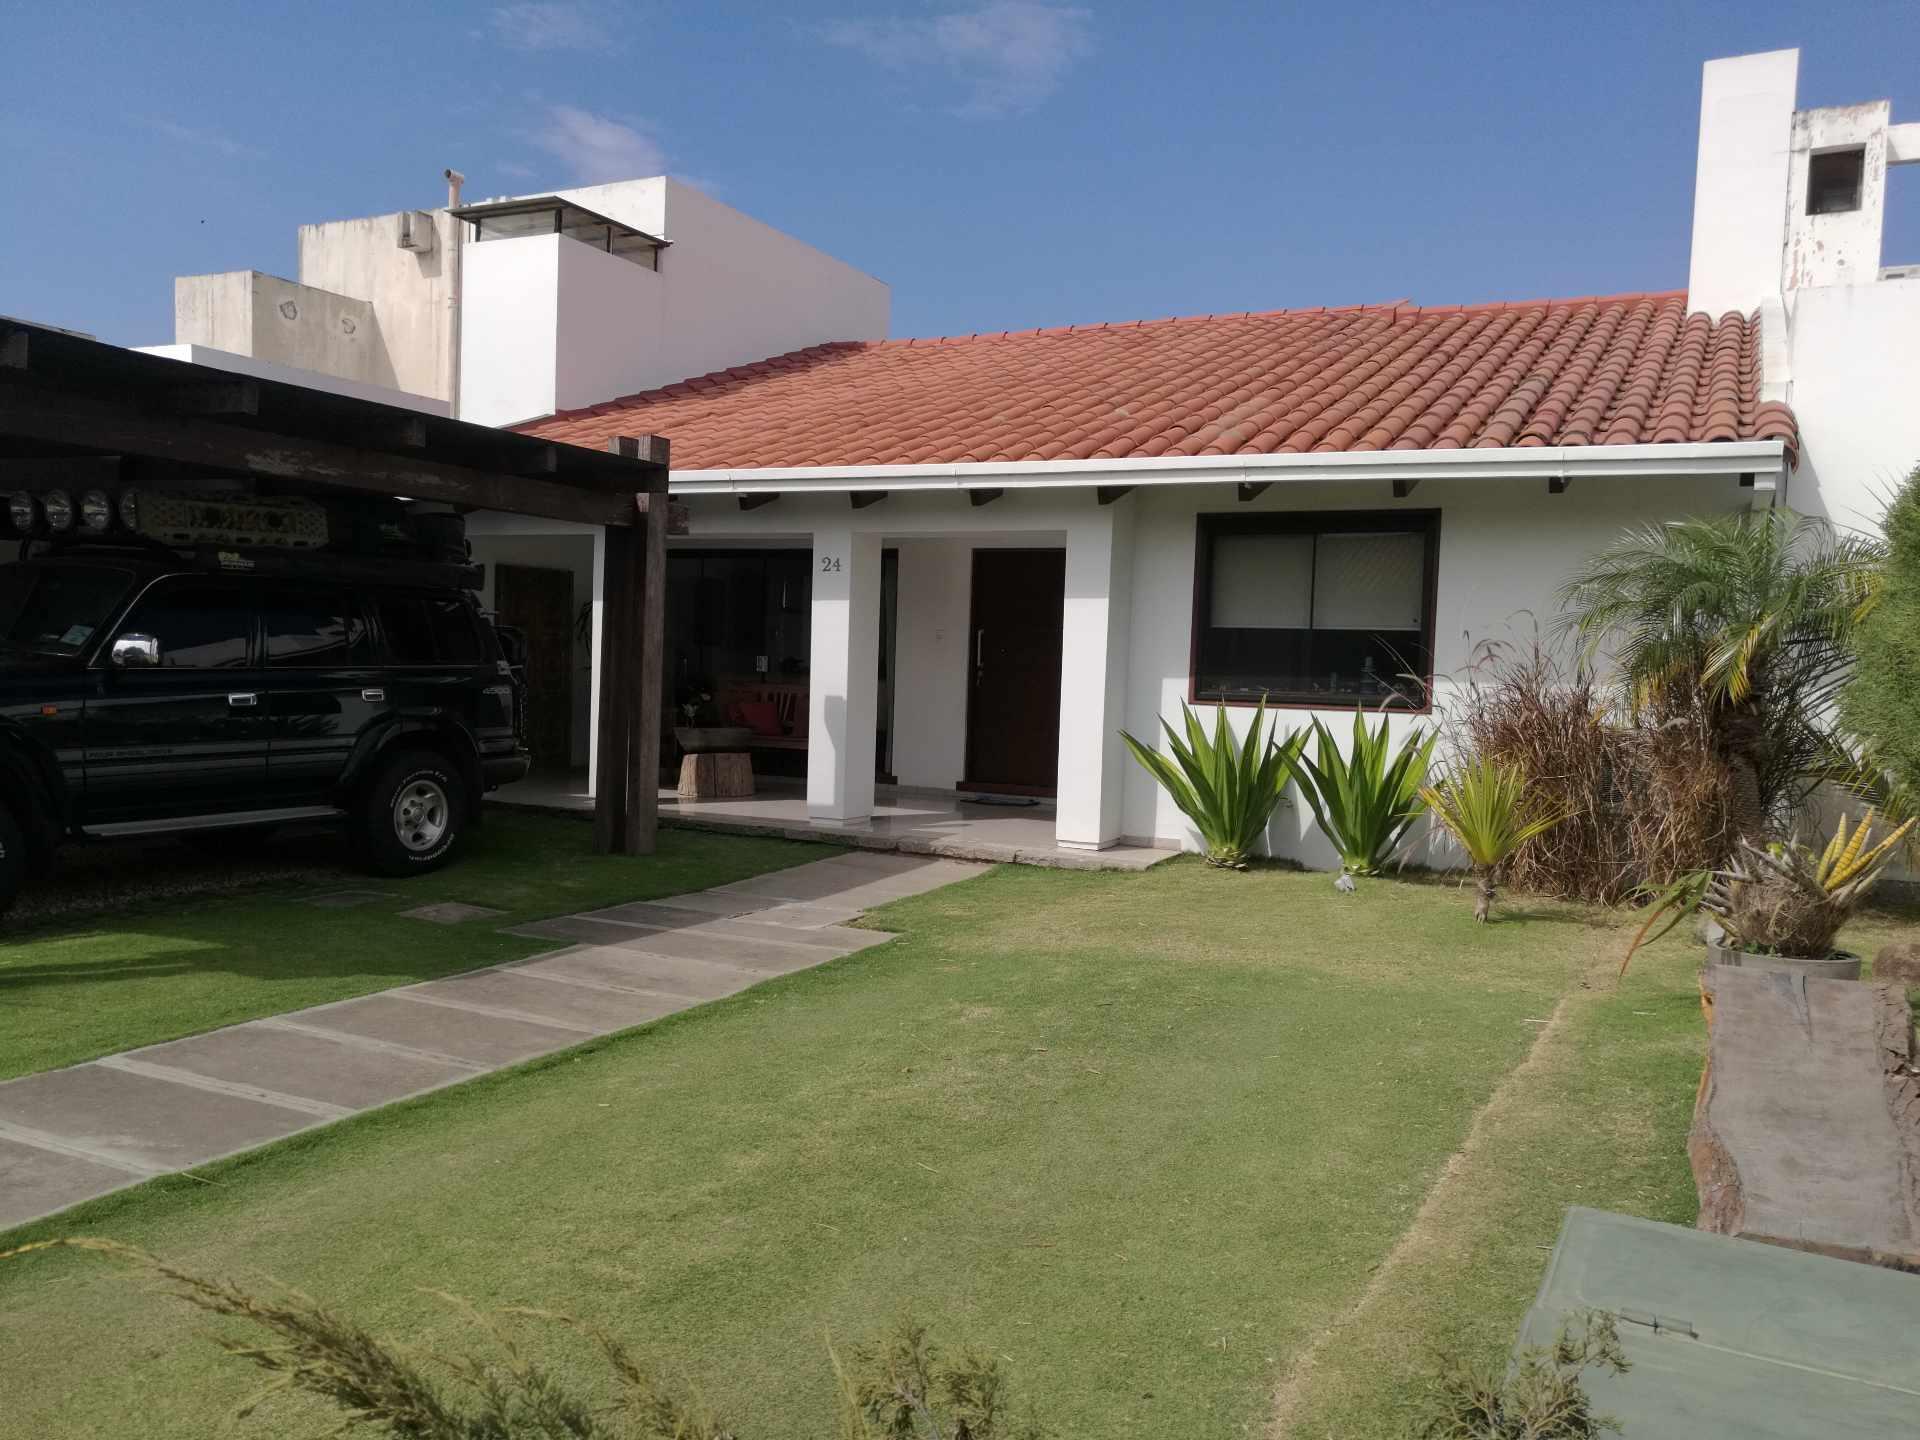 Casa en Venta Condominio La Hacienda I 5to anillo entre Av Cristo Redentor y Av. Beni Foto 10